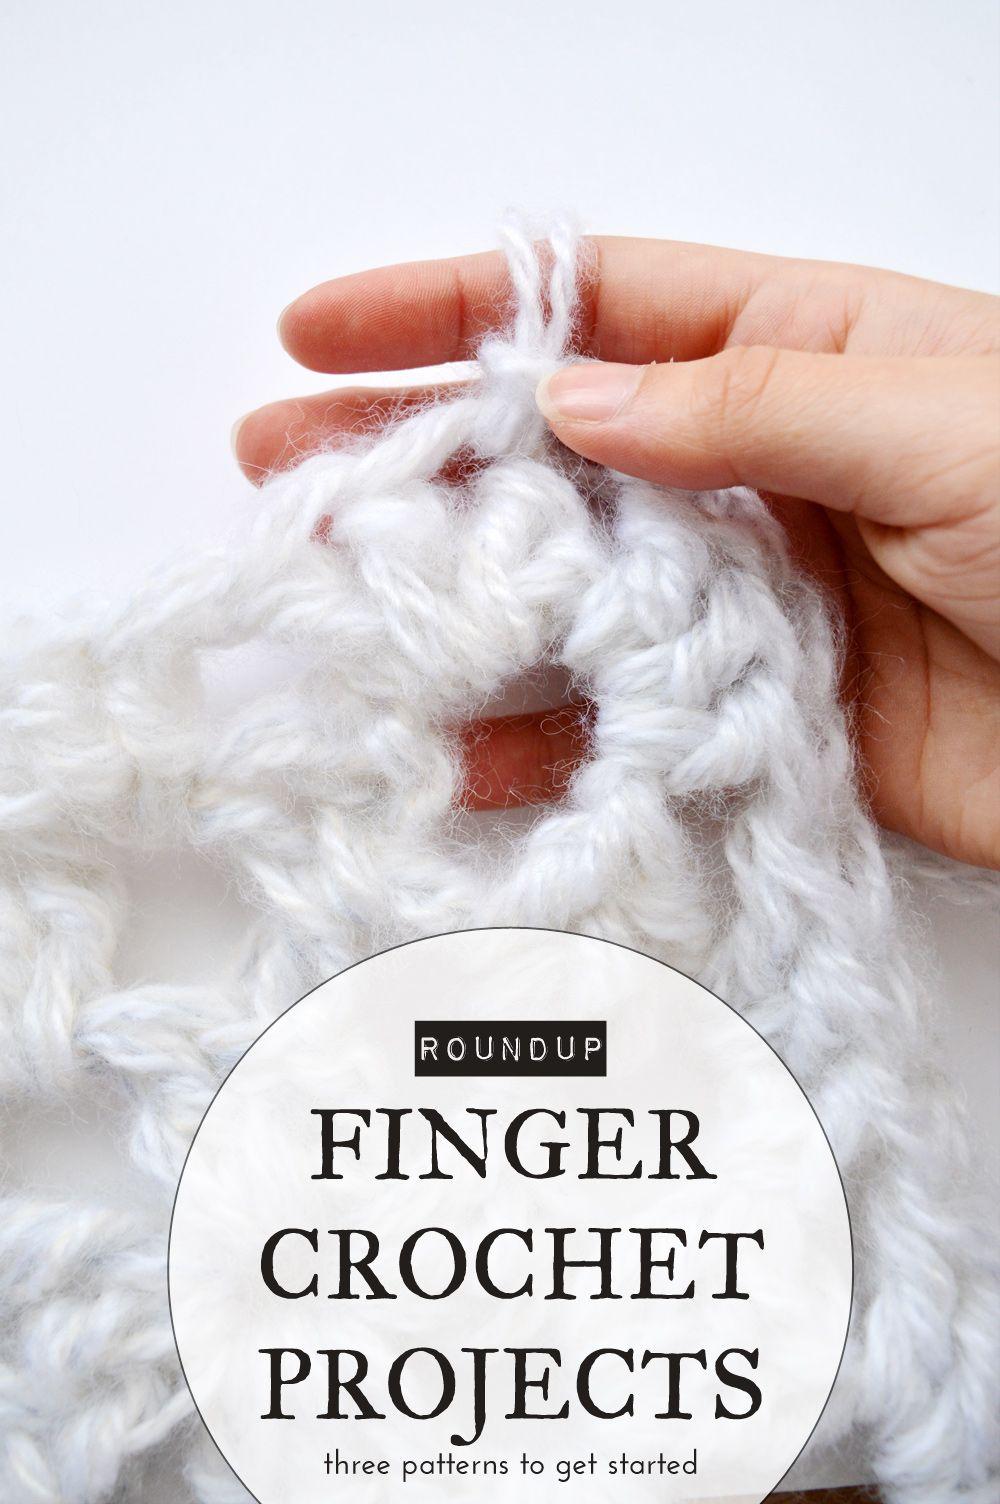 Finger crochet projects to get started | Crochet | Pinterest ...